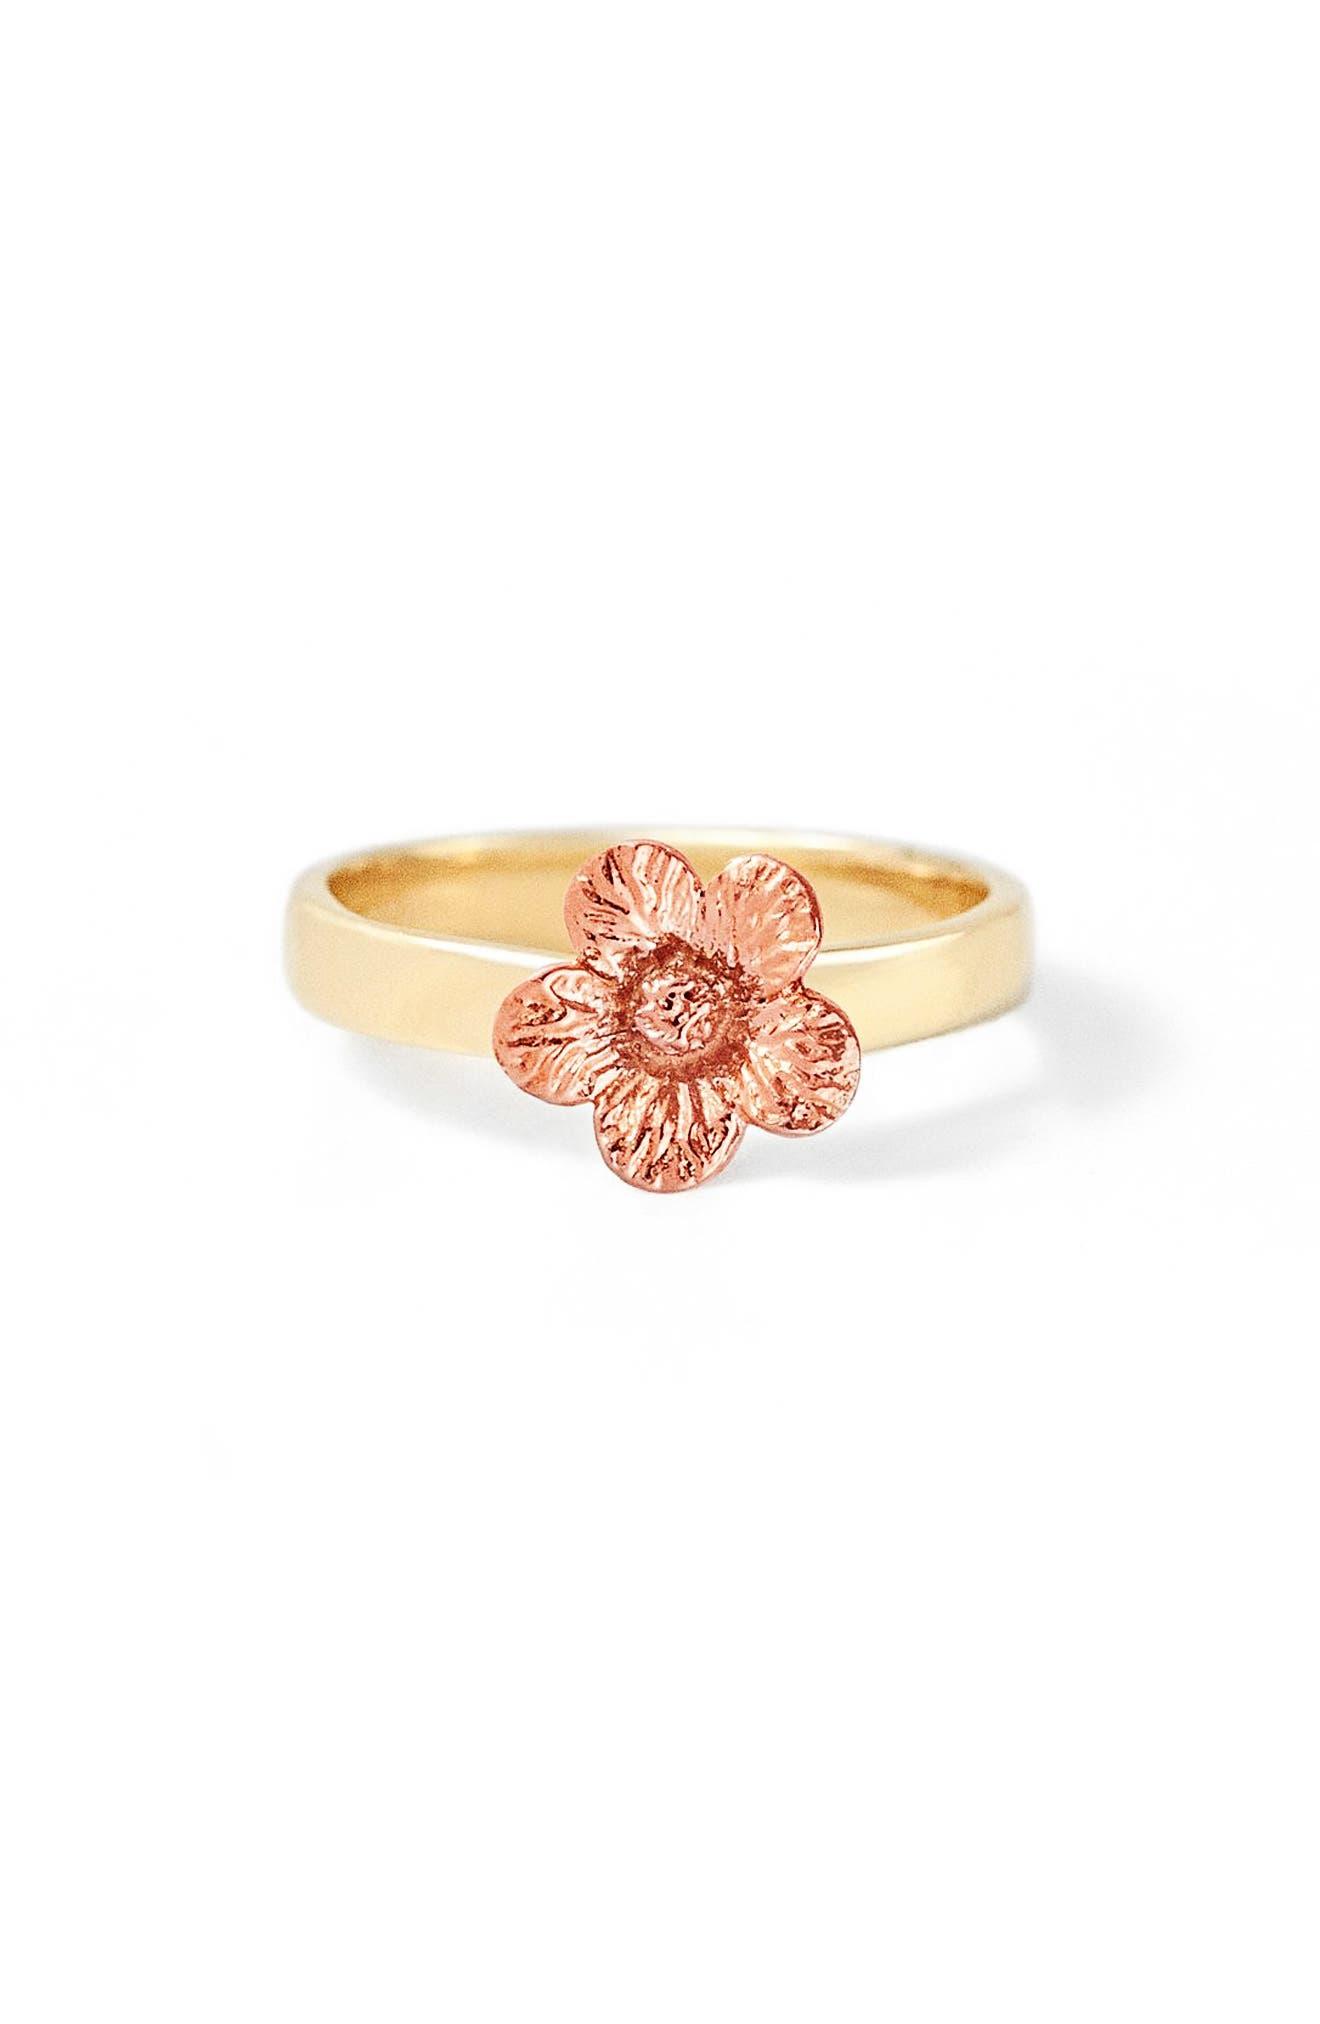 Flora Petunia 14K Gold Ring